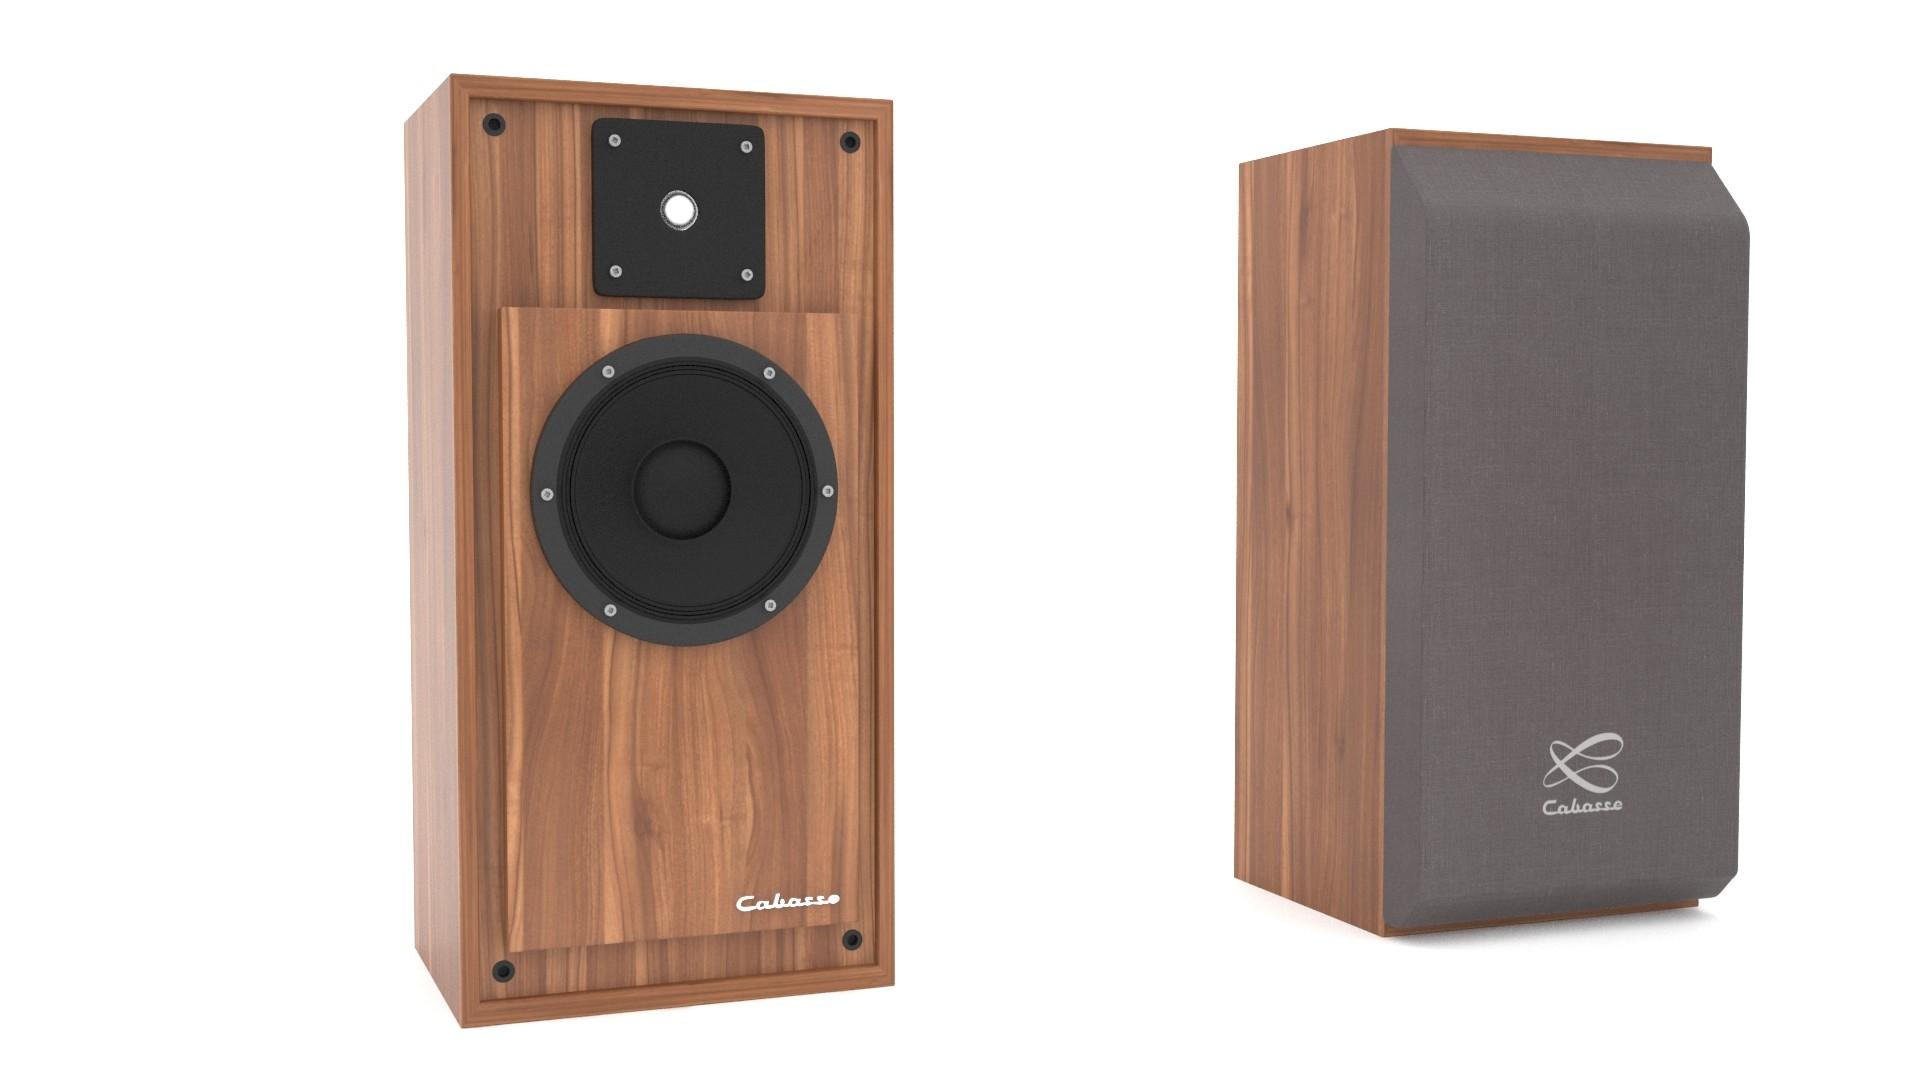 3d speaker cabasse model